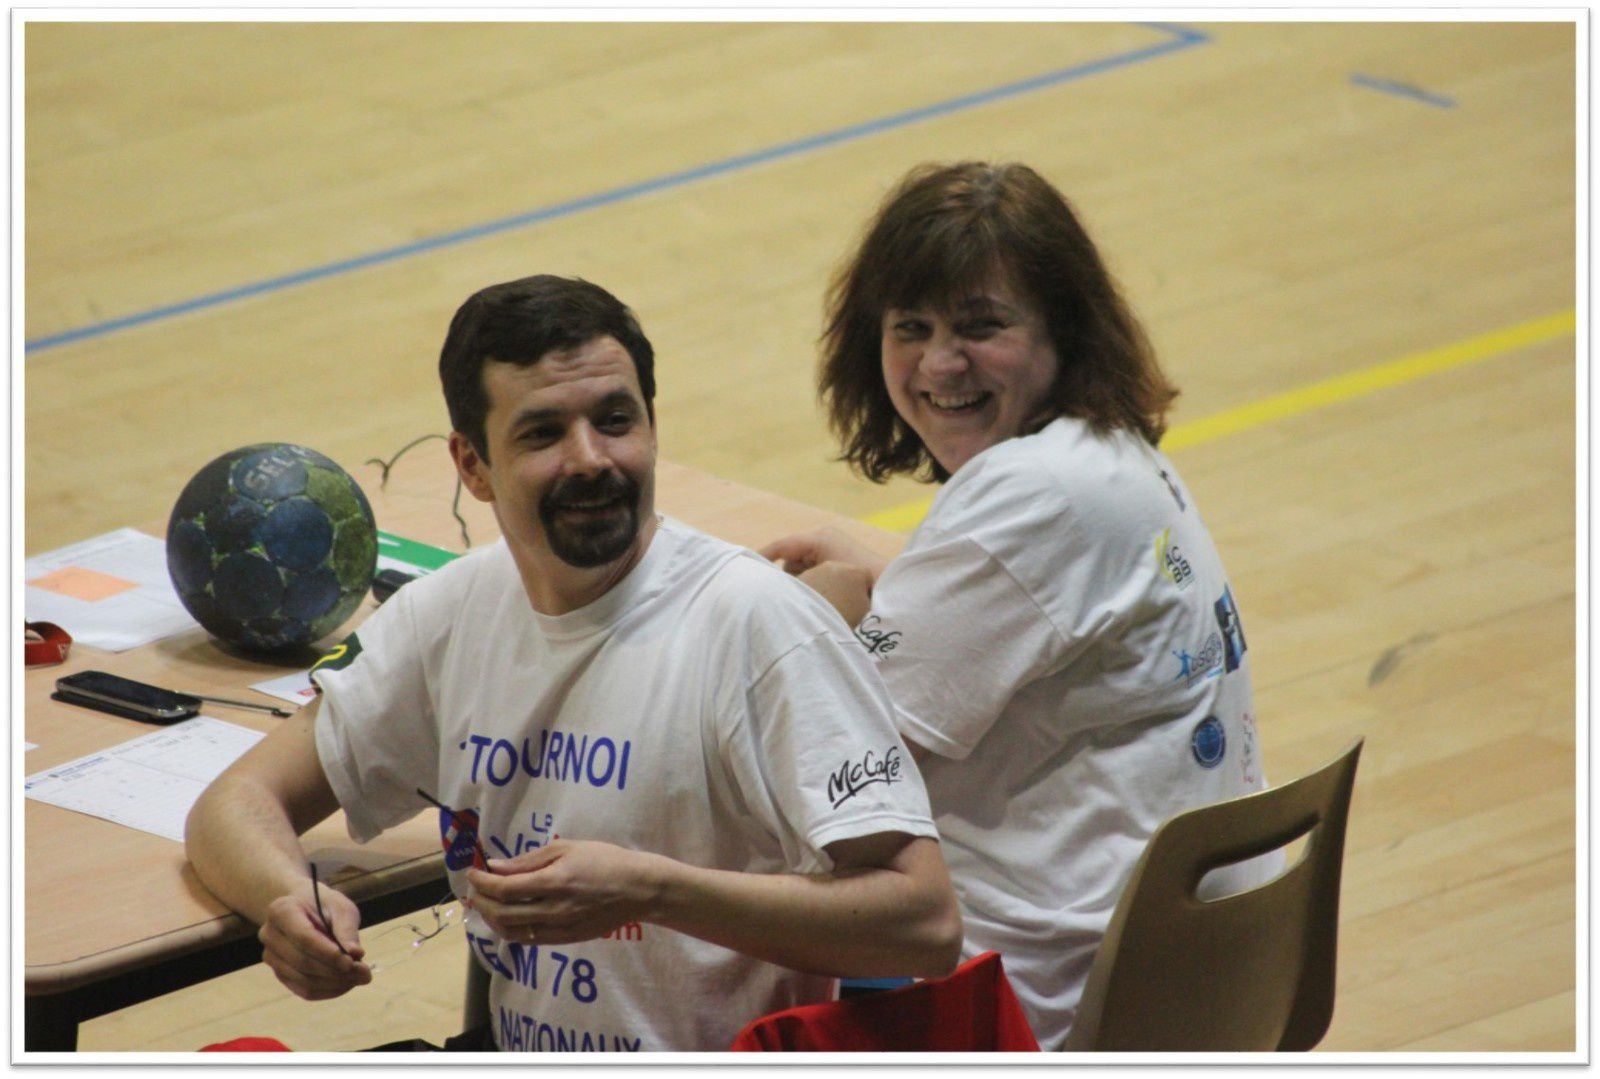 "Tournoi ""Hand-Expert"" Team 78 - 25.04.2015 (PCT-18M) 1/4"